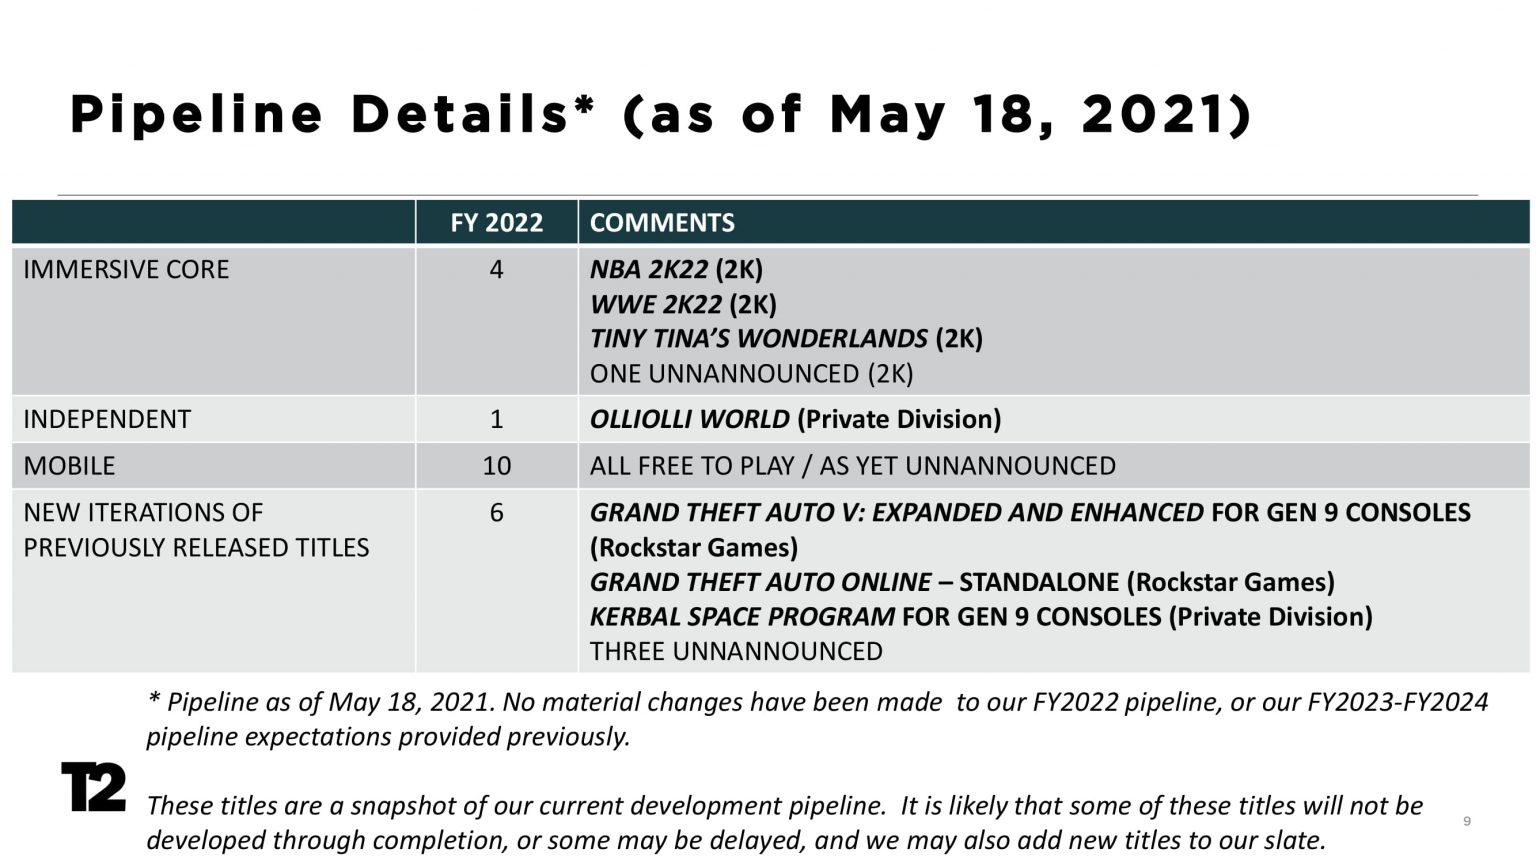 Take-Two: Financial Results Q1 2022